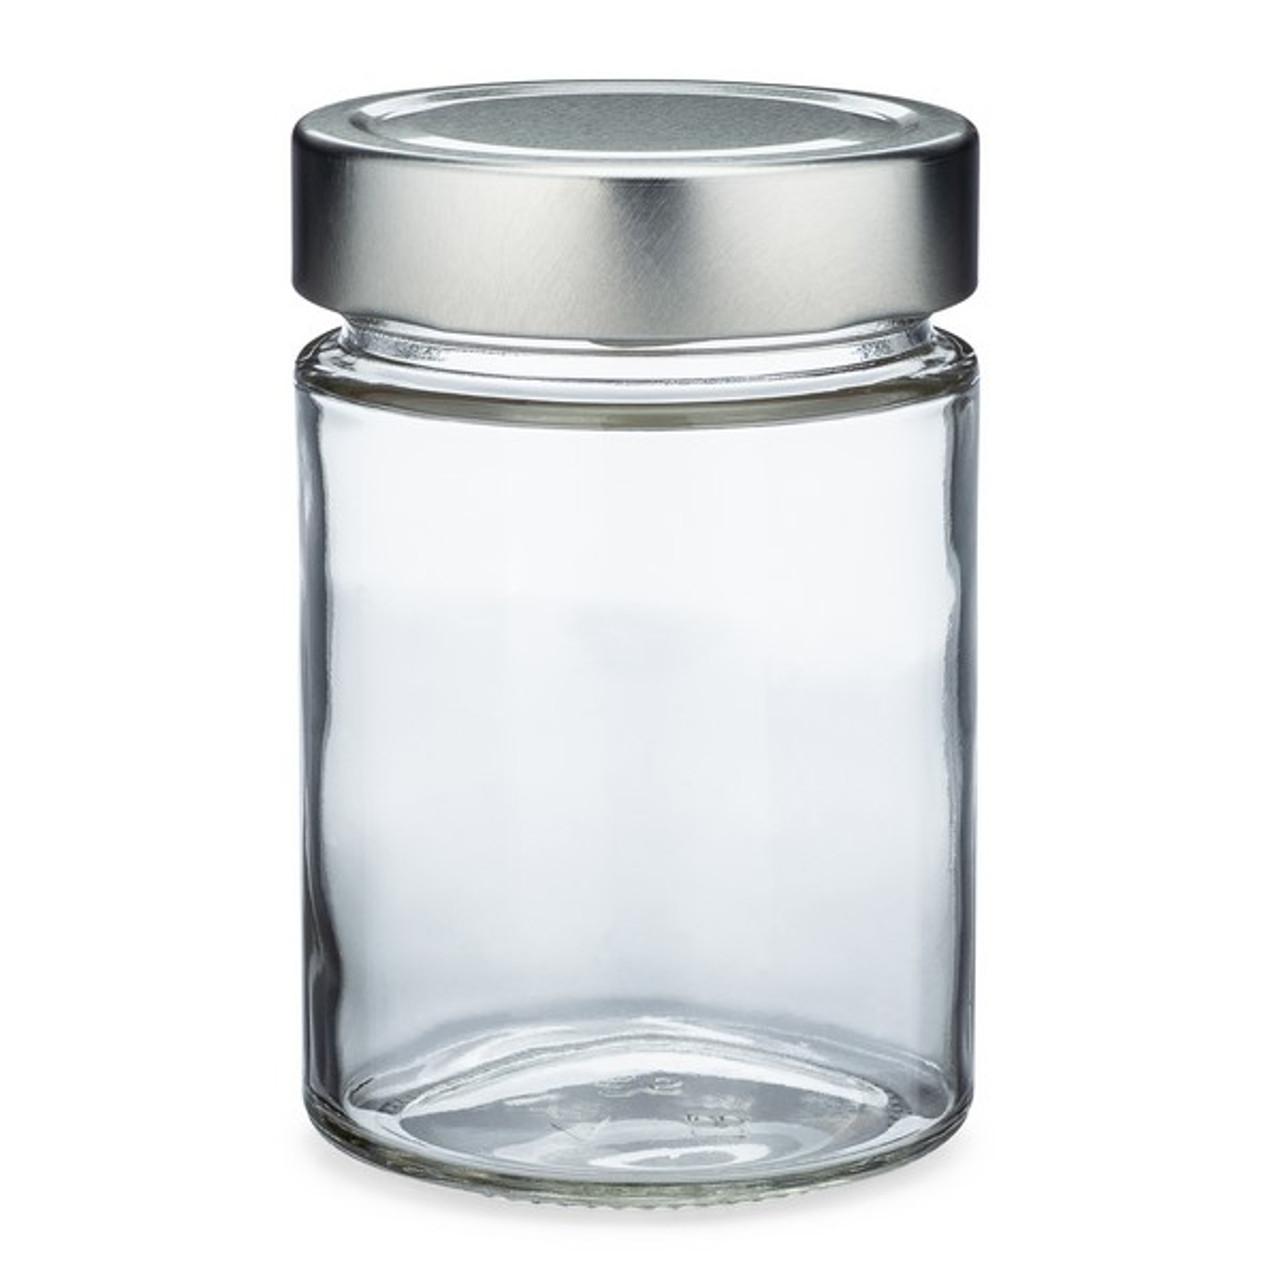 10 oz Clear Glass Ergo Food Jars (Silver Metal Lug Caps) - BP400582SLV